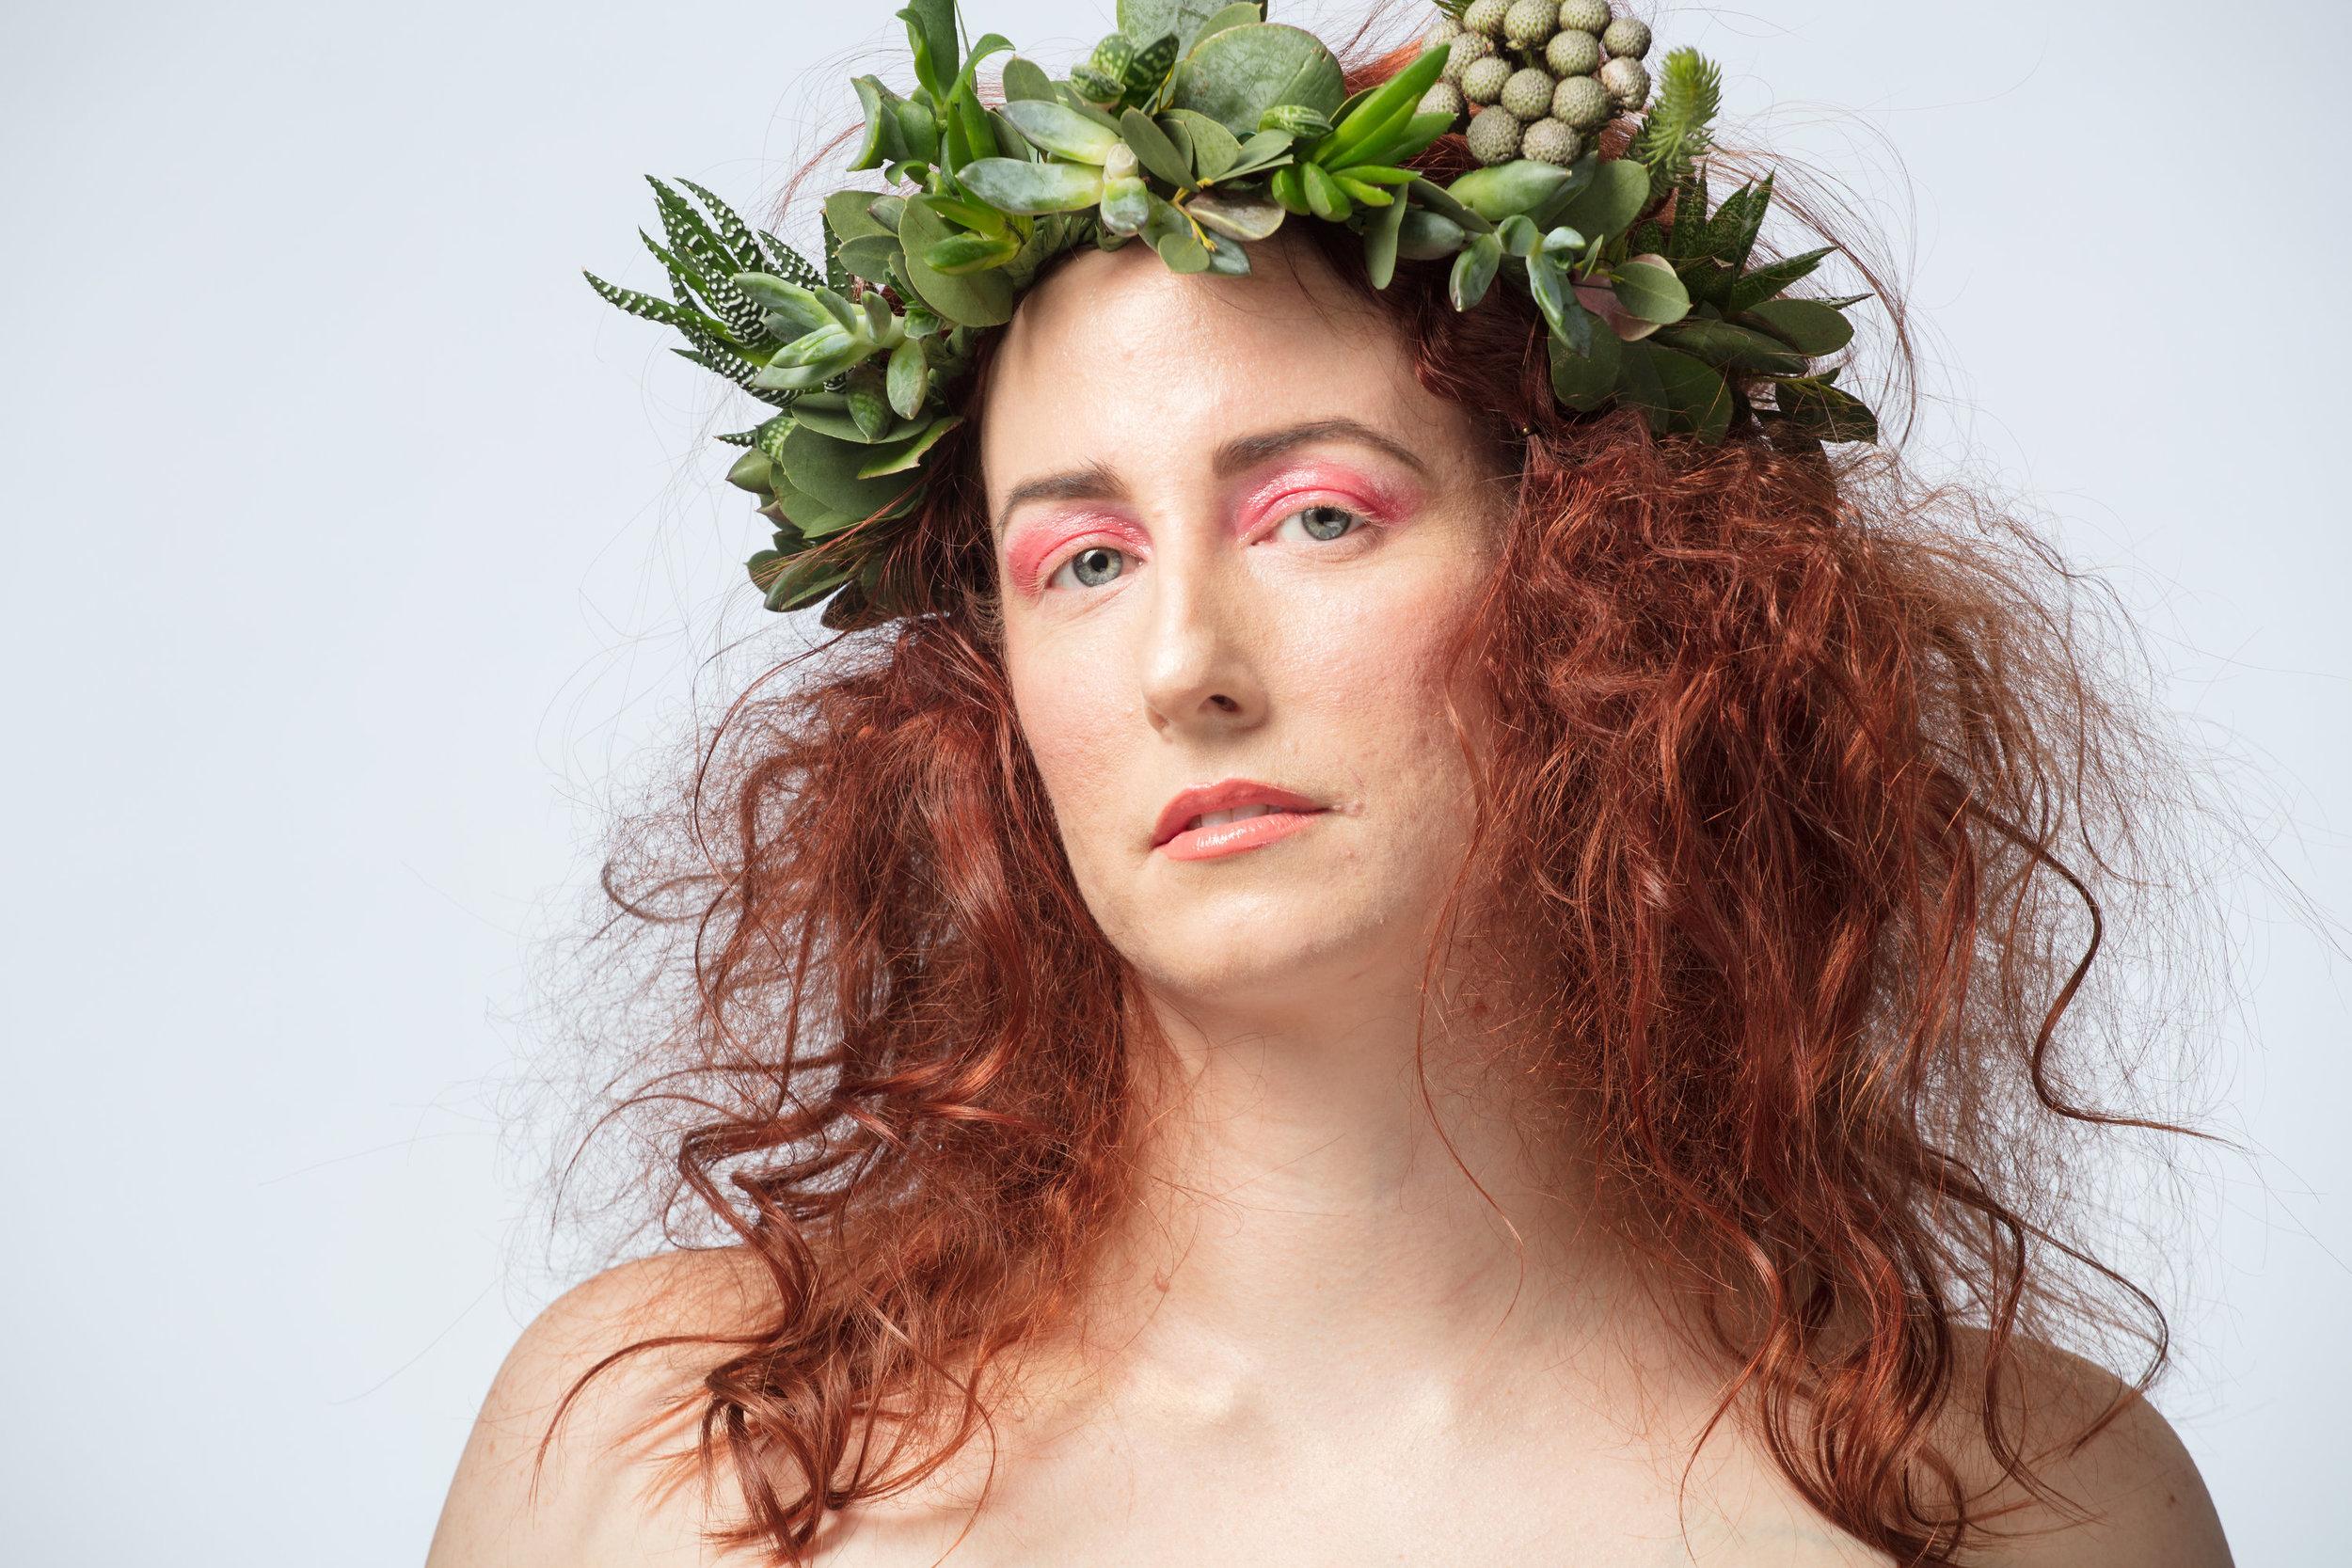 Model' Erin Popadynetz @vancouverin  Photographer: Rob Trendiak @trendiphotography  Flower Crown: @conceptfloral